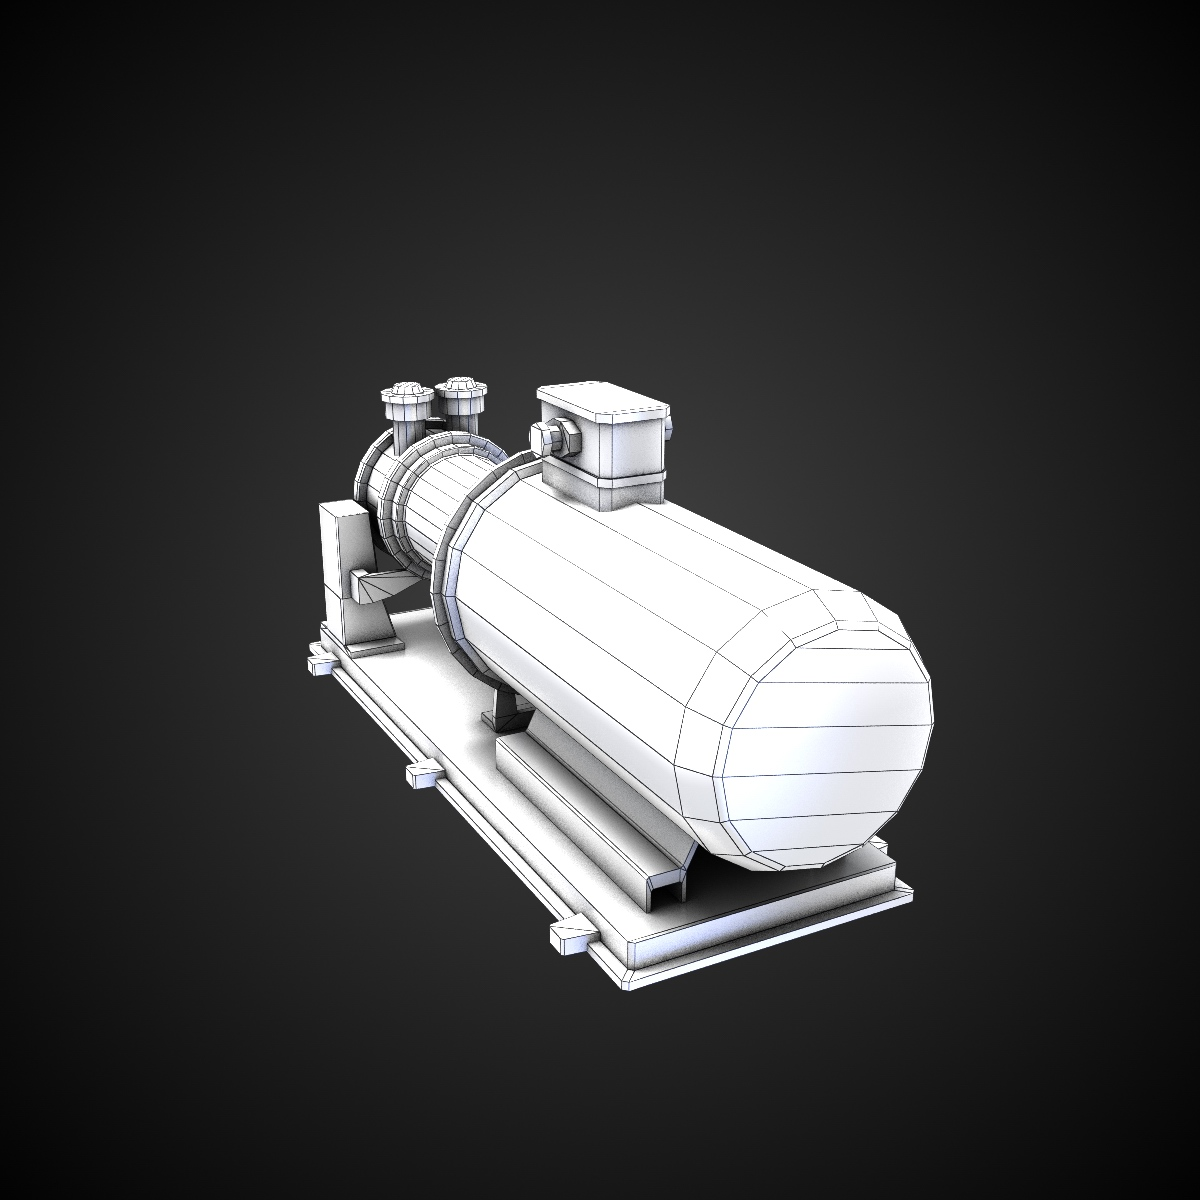 3D model RPG-7 VR / AR / low-poly MAX OBJ FBX LWO LW LWS